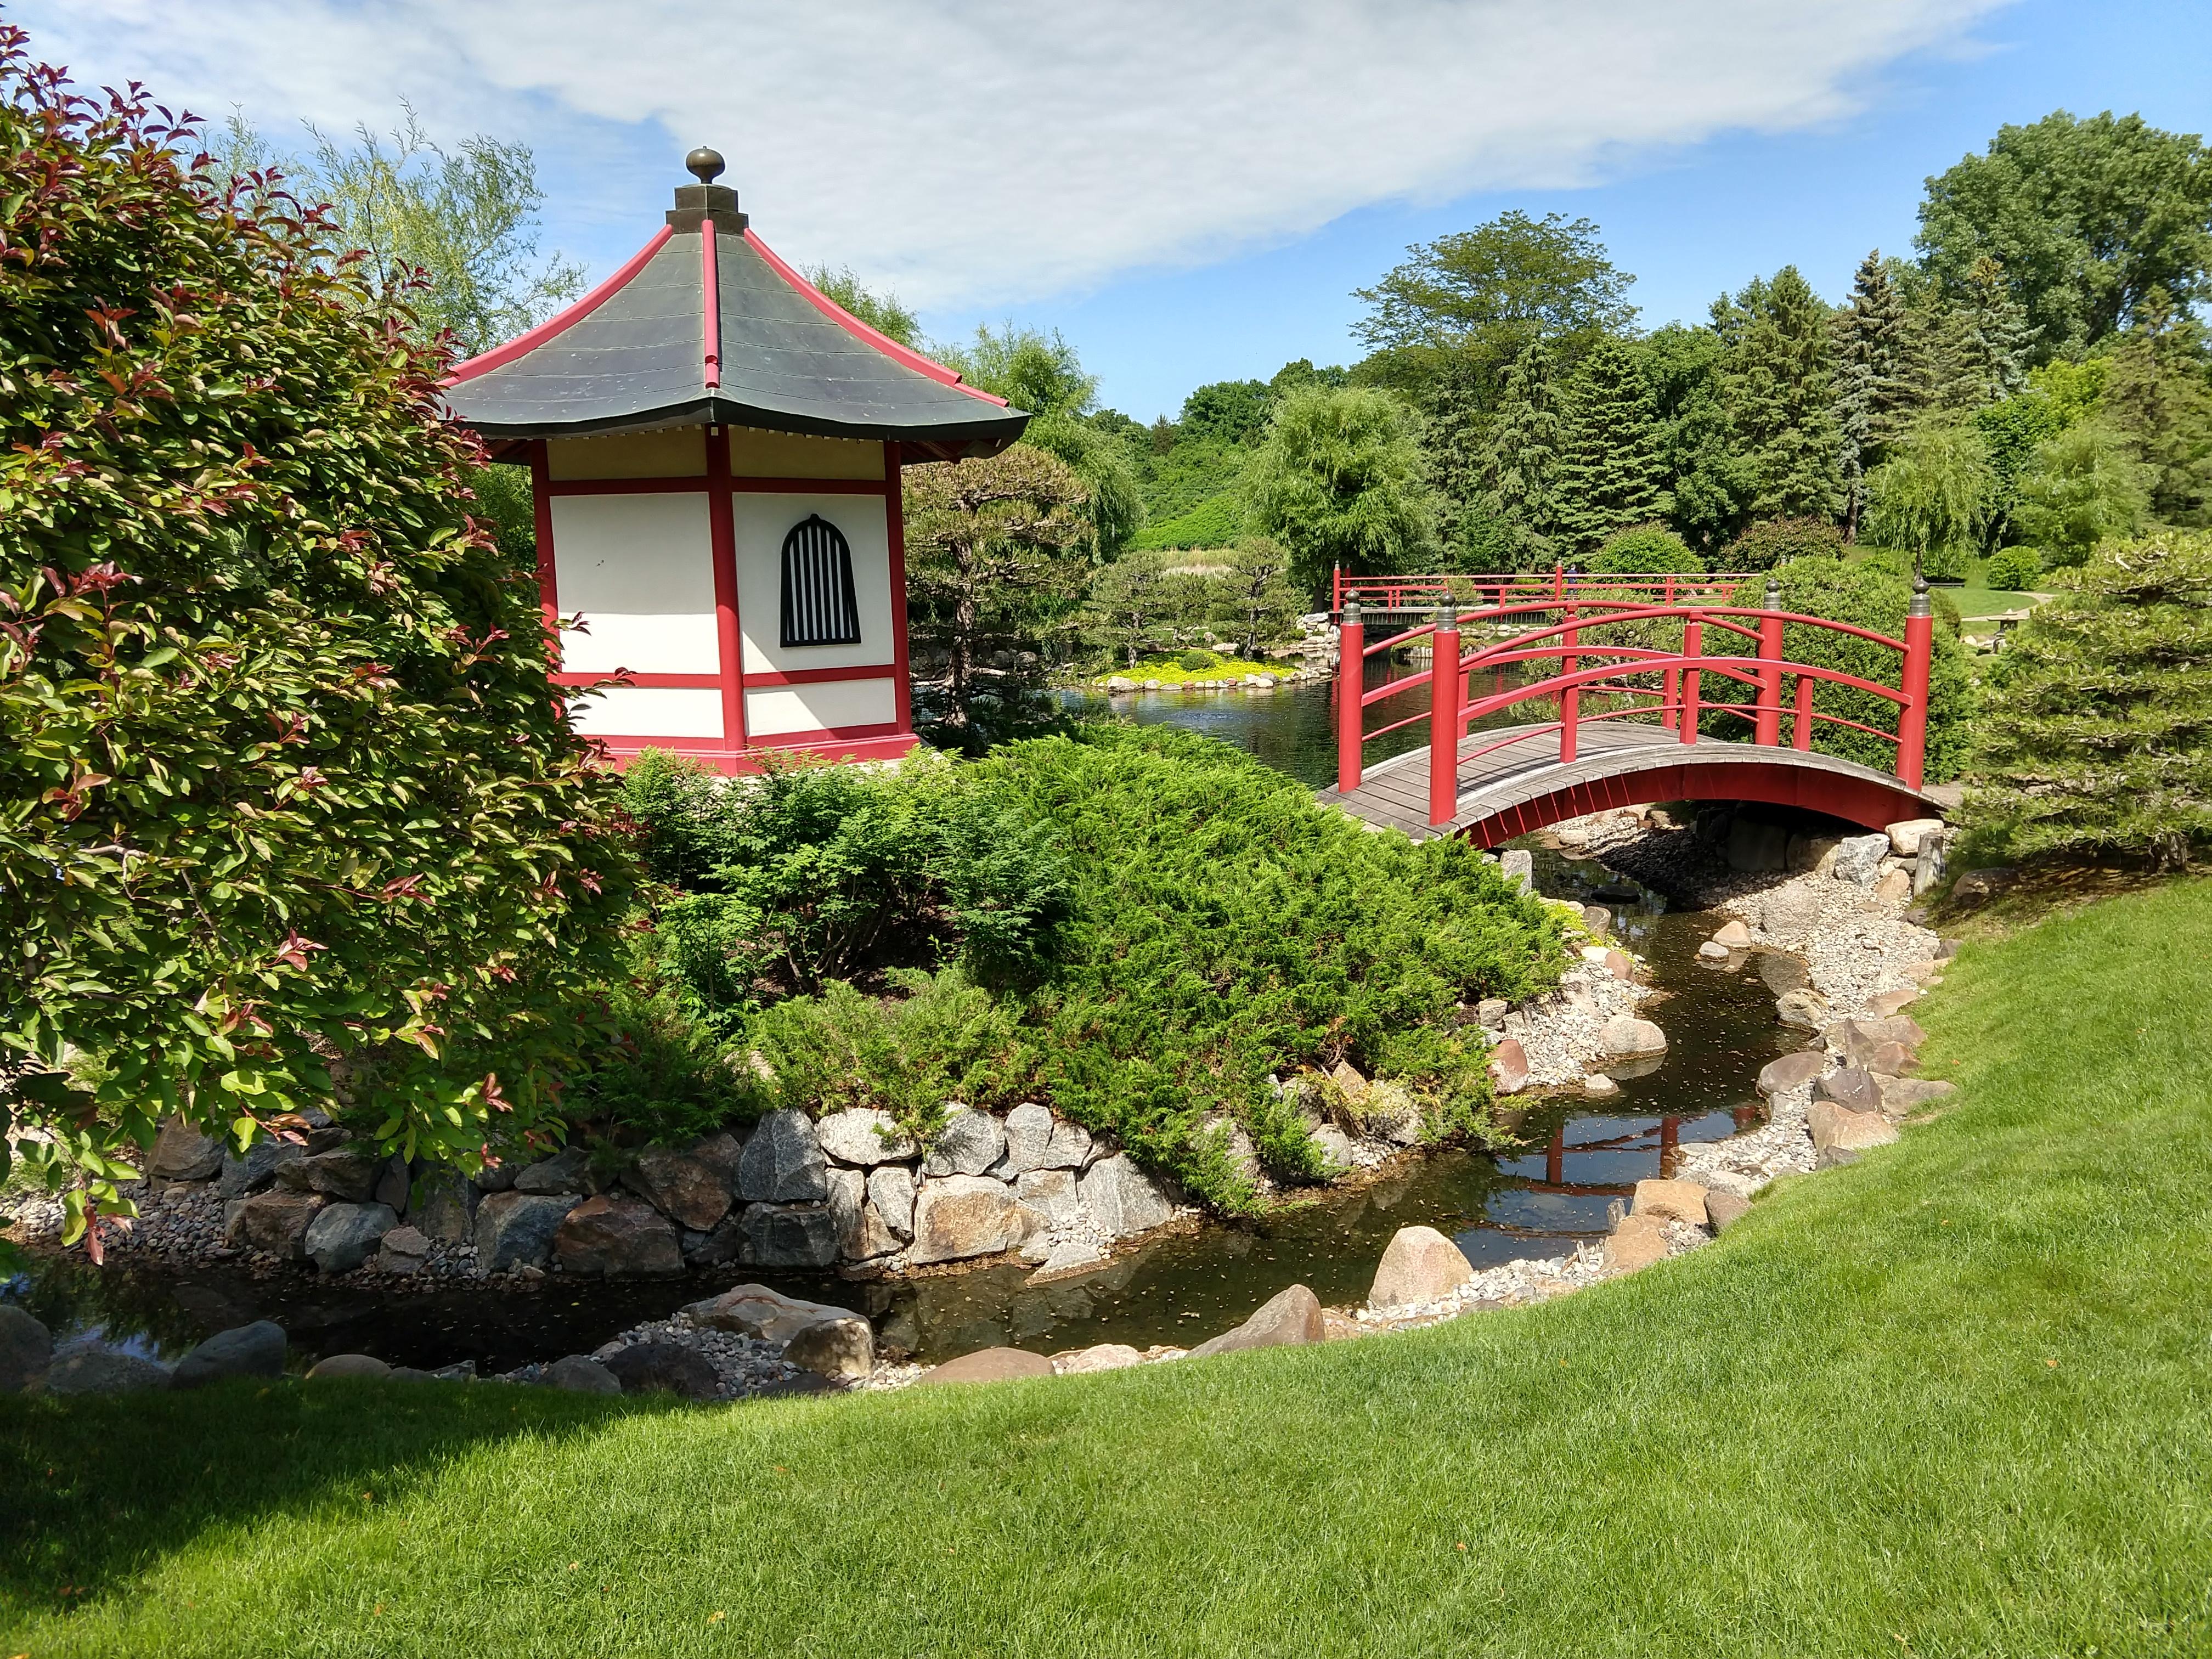 File:Normandale Community College 15 - Japanese garden.jpg